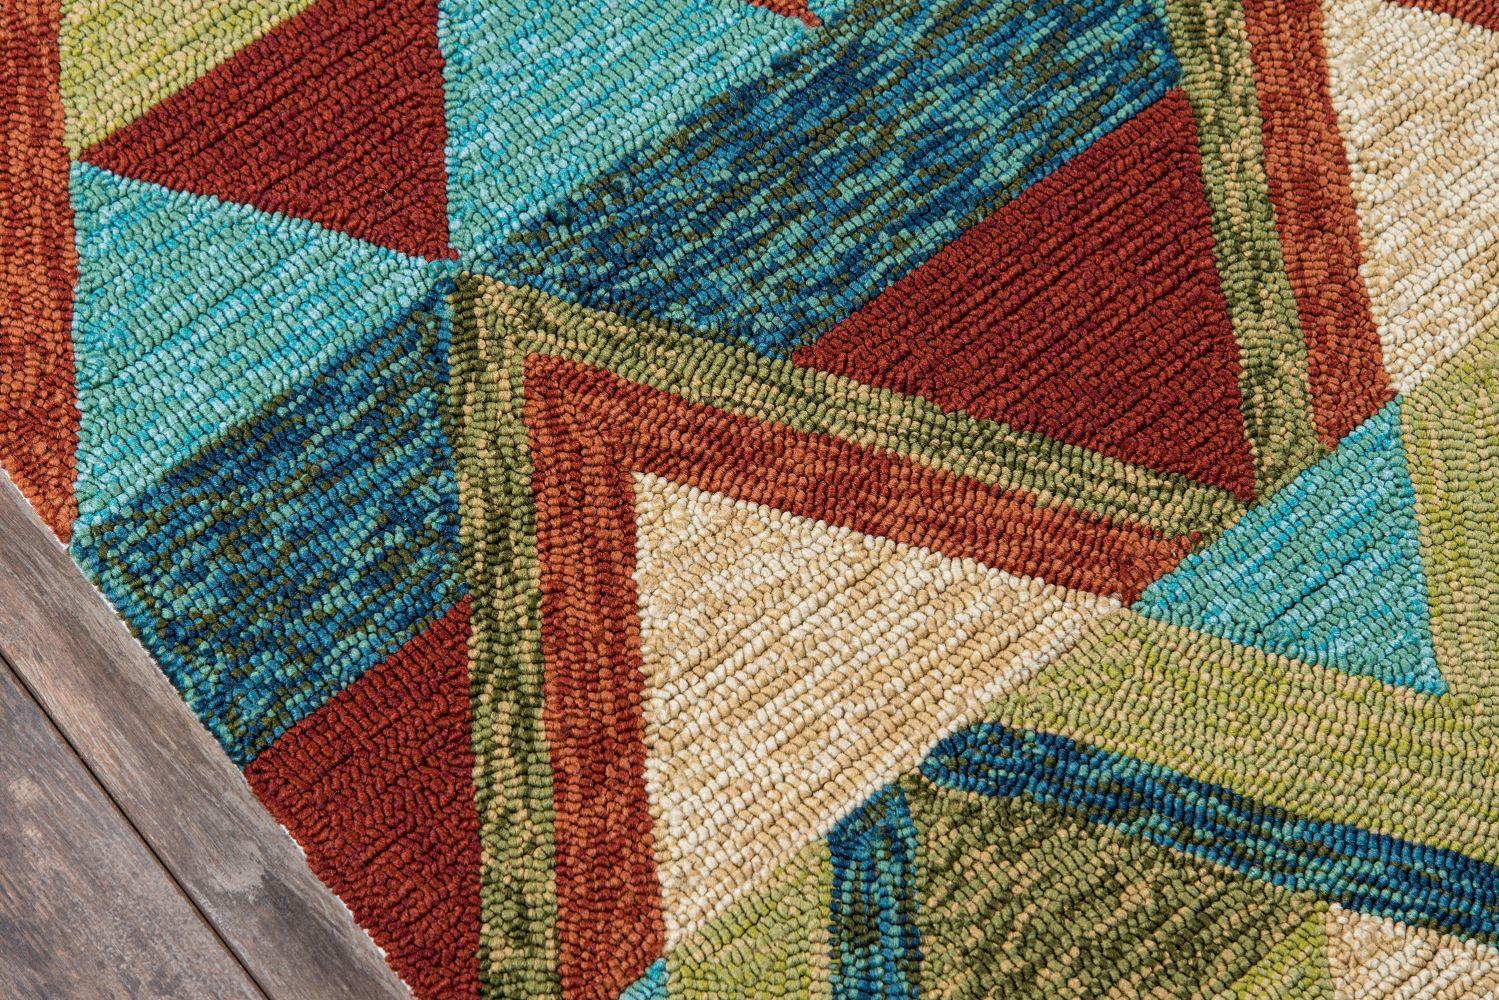 Momeni Veranda Vr-32 Multi 9'0″ x 9'0″ Round VERANVR-32MTI900R